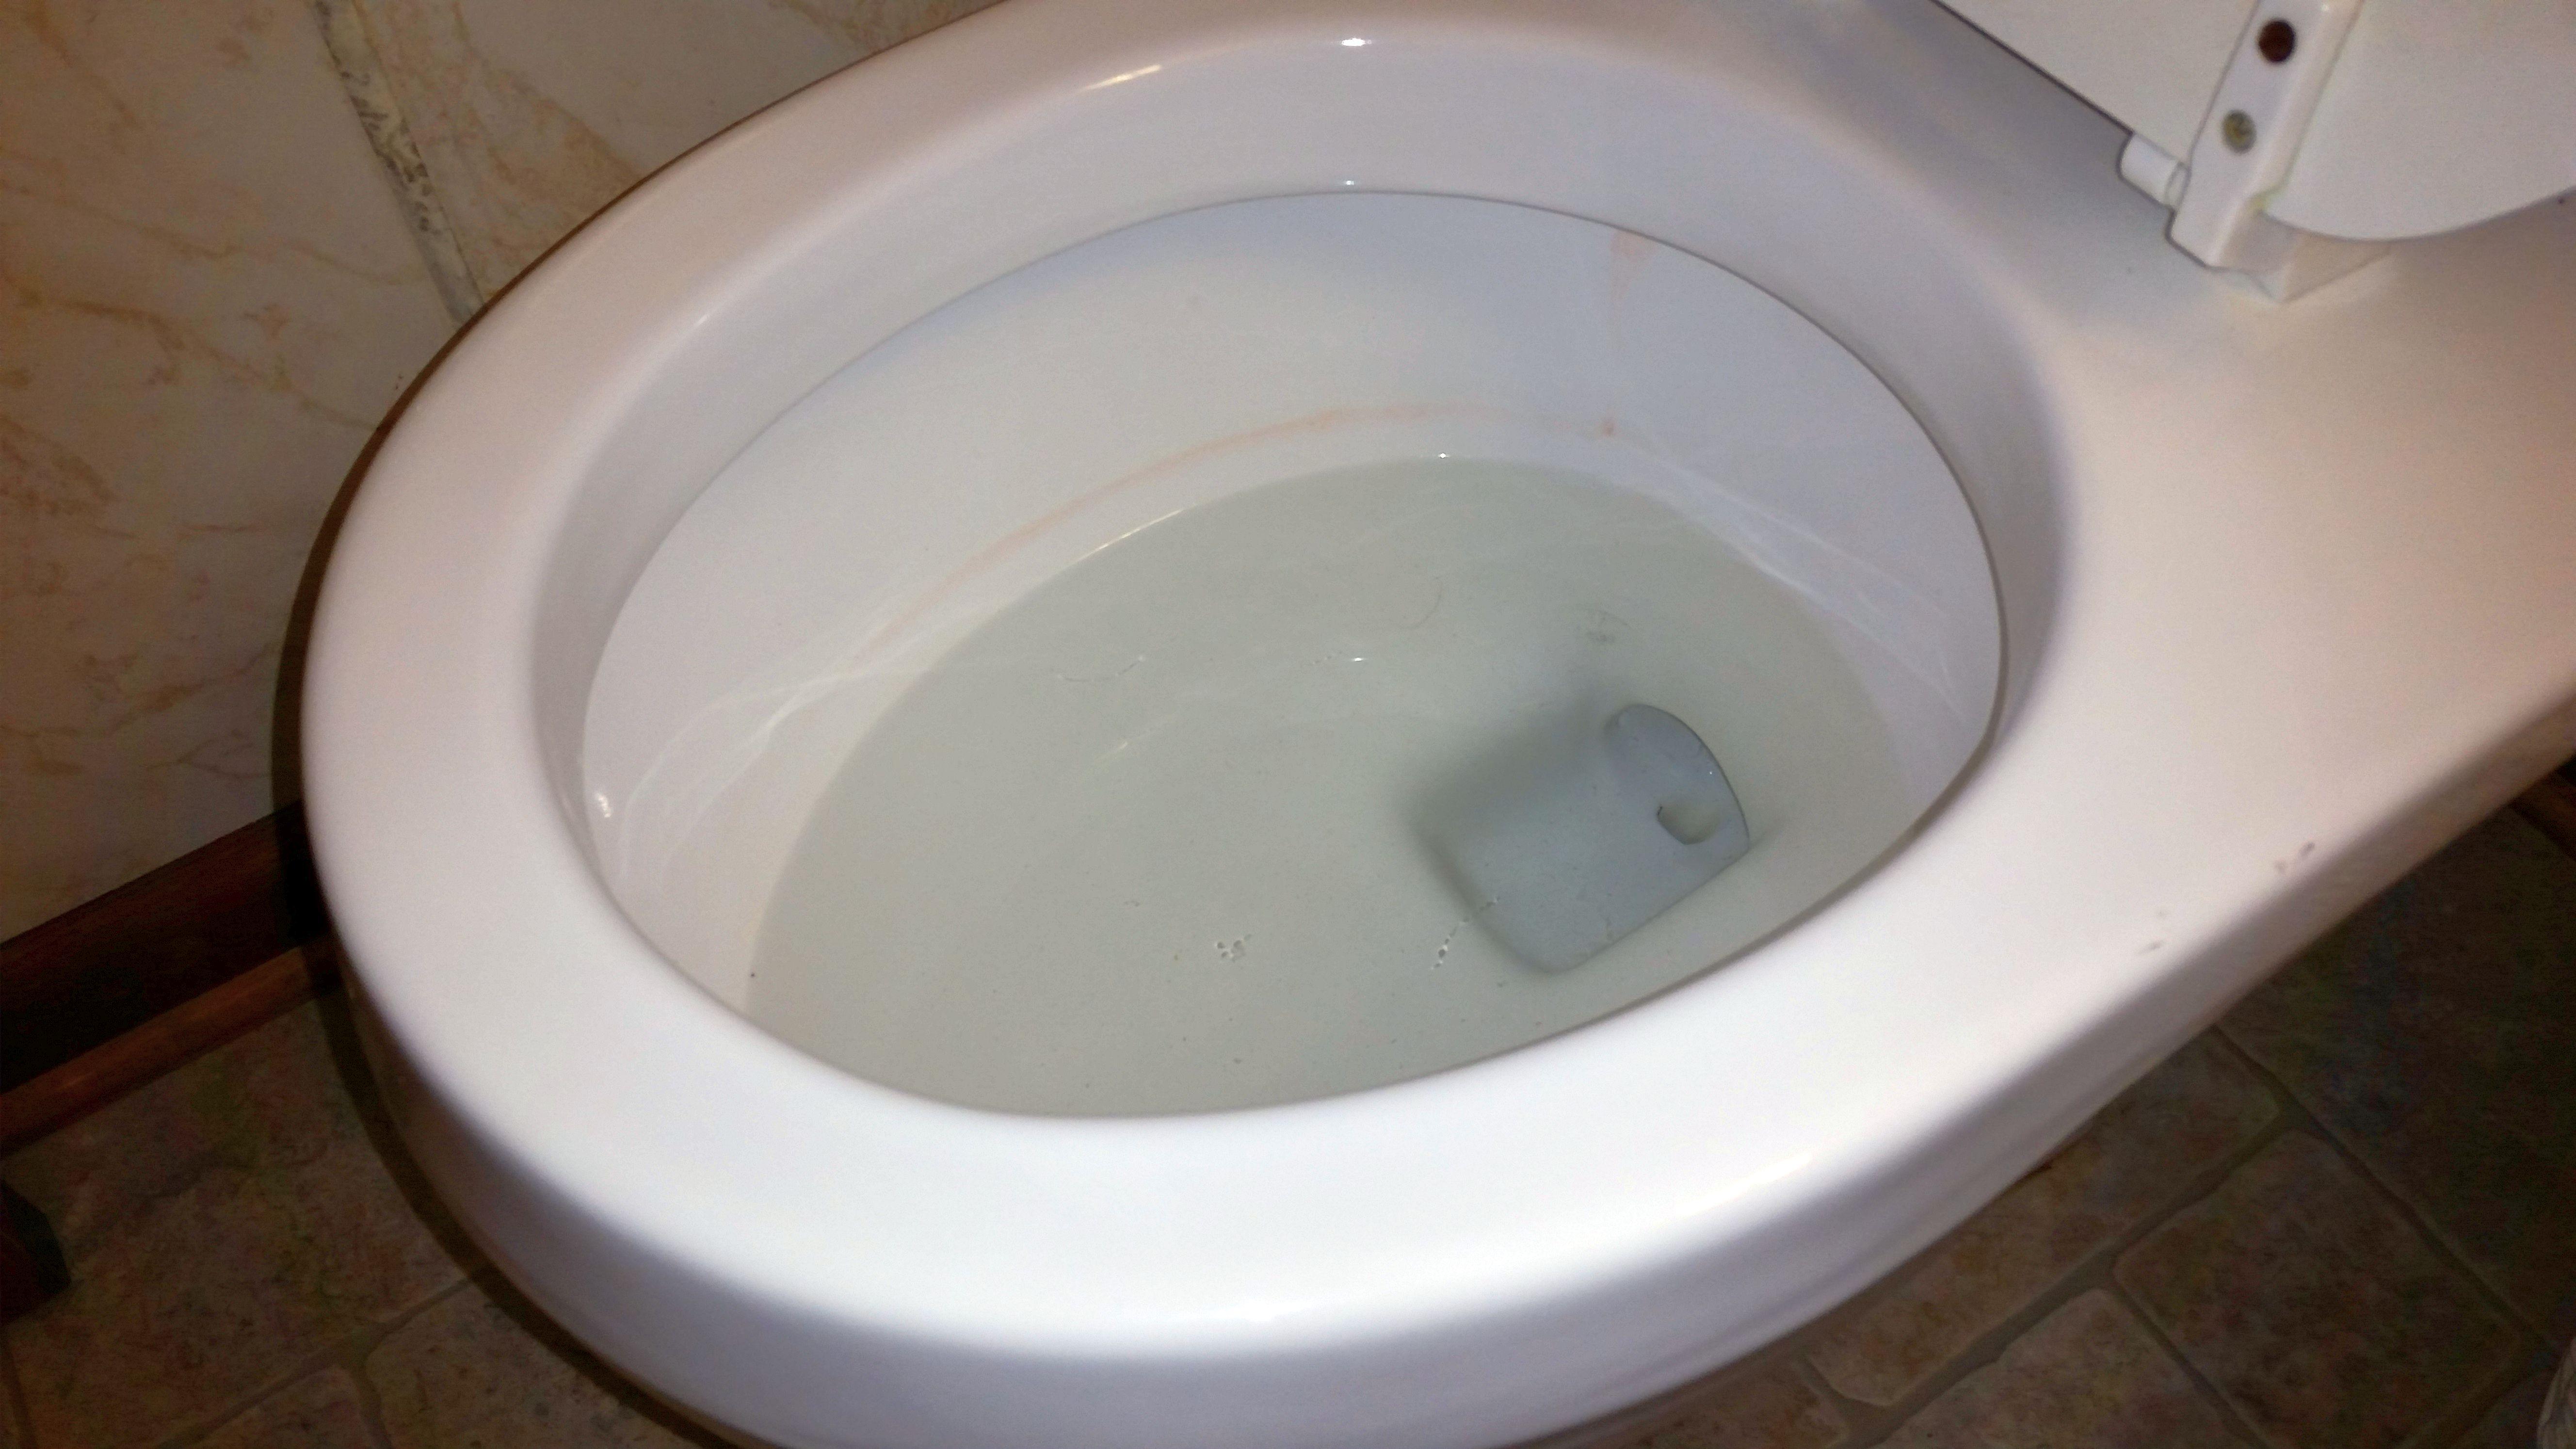 Bathroom toilet bowl